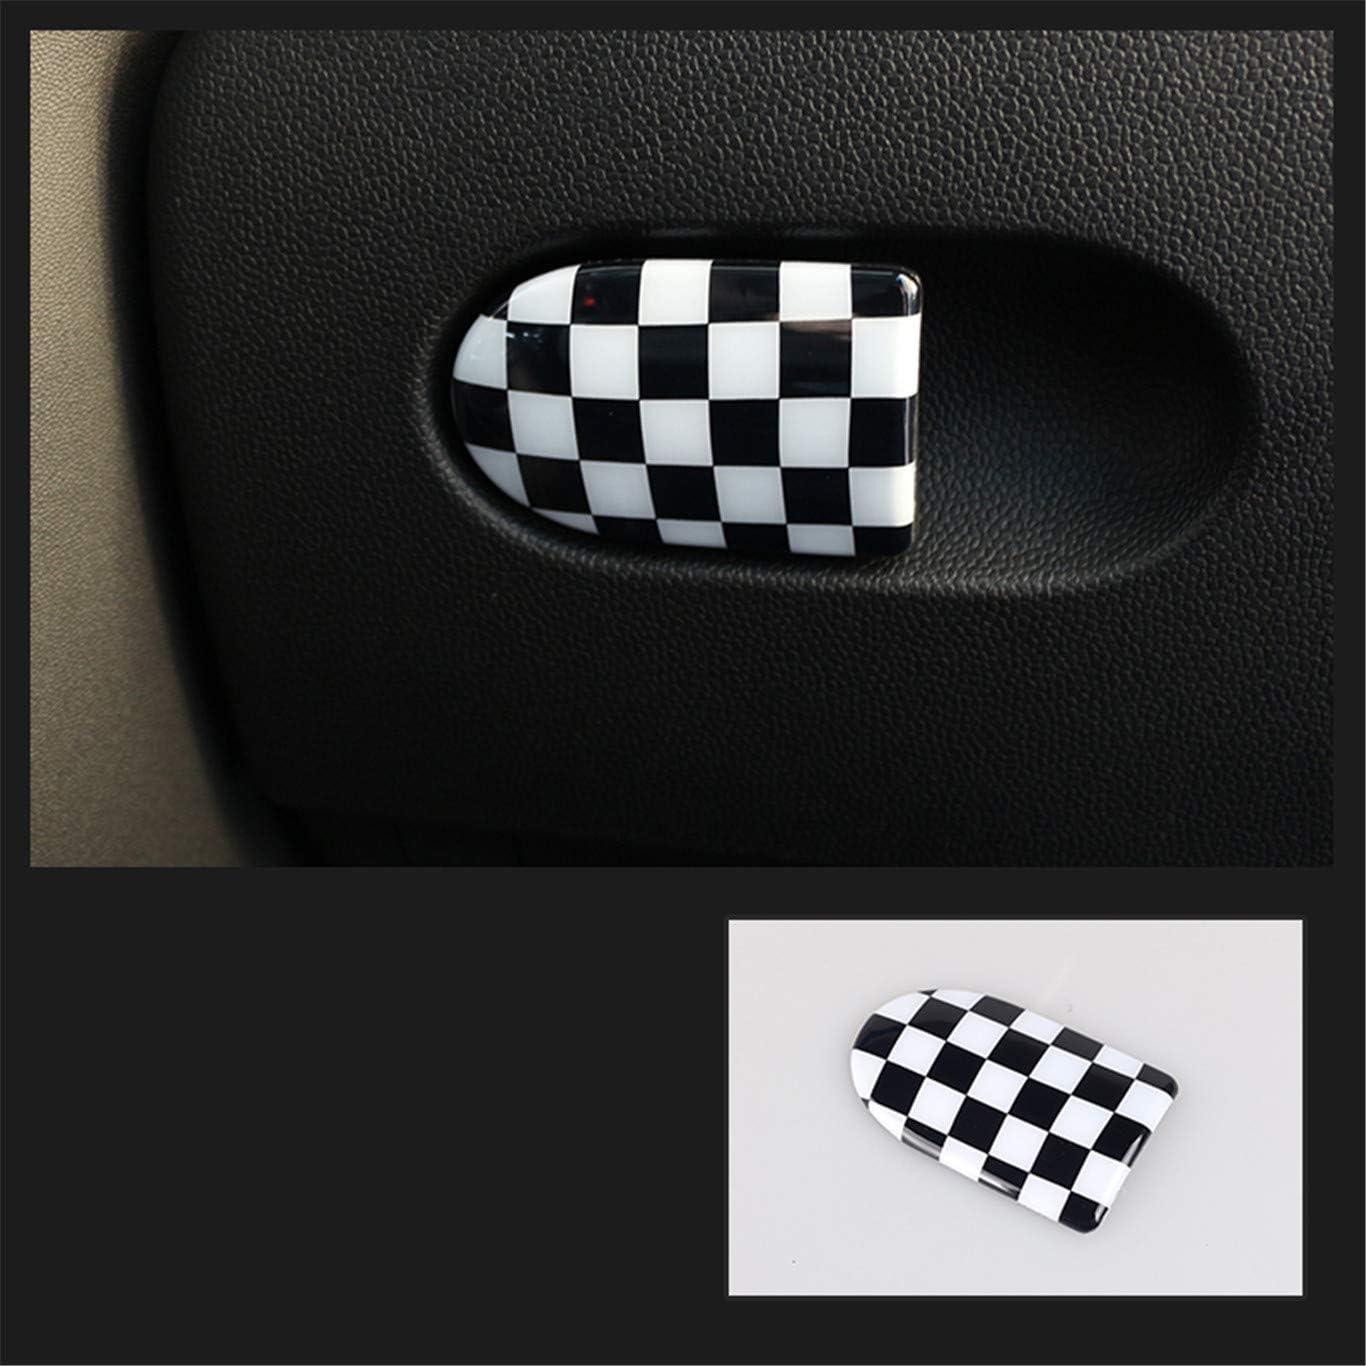 HDX Cubierta para Puerta de Caja de Almacenamiento ABS para Mini Cooper F54 Clubman F55 Hardtop F56 Hatchback F57 Covertible F60 Countryman